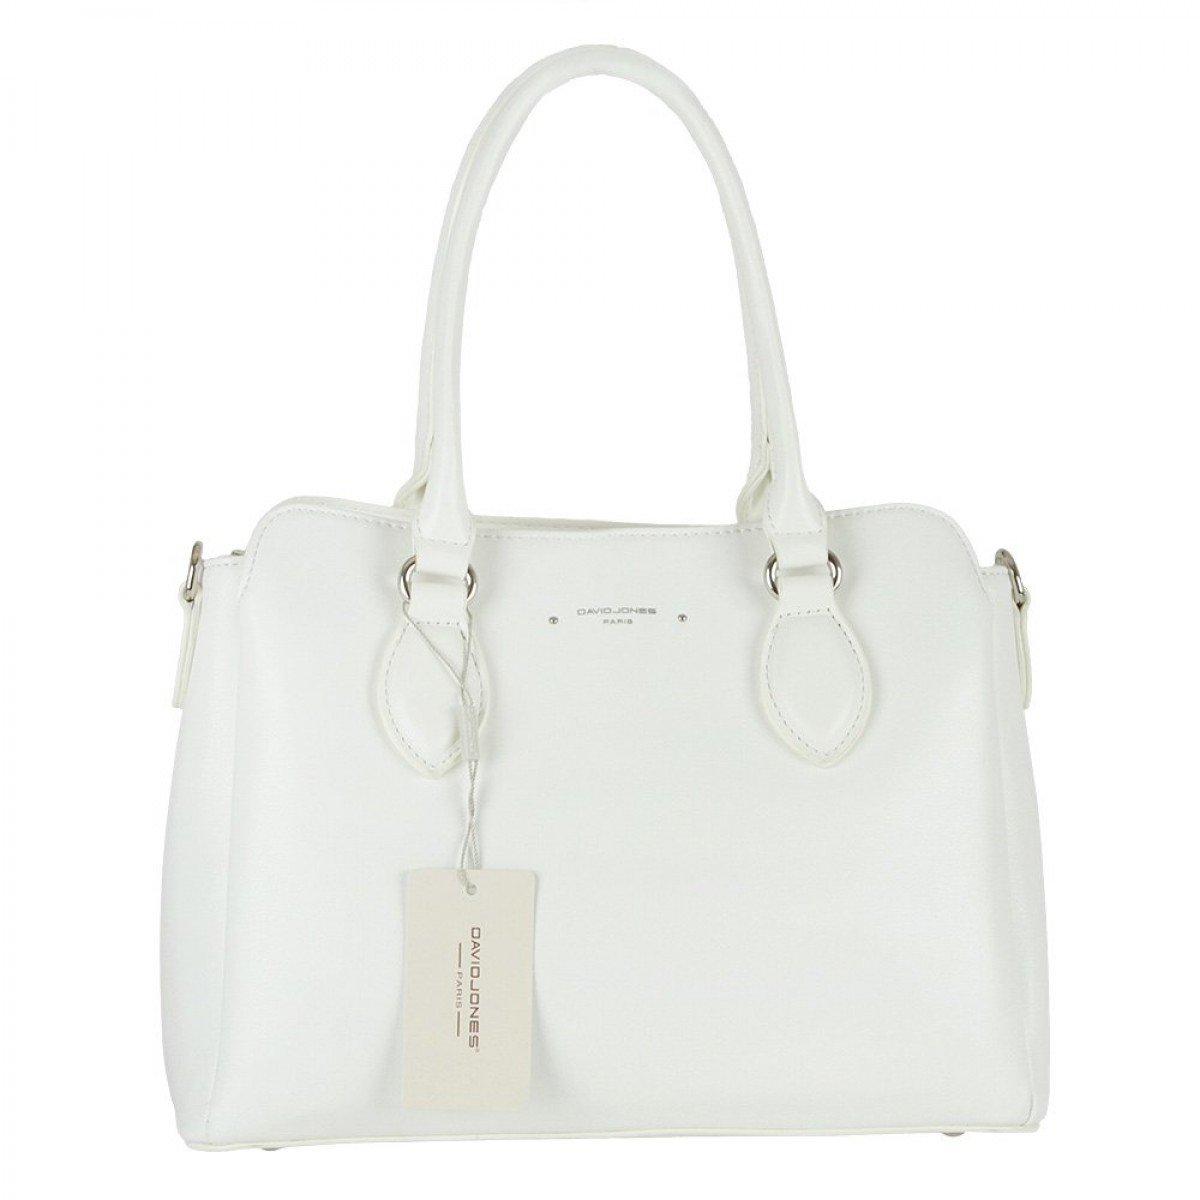 Жіноча сумка David Jones 6295-2 WHITE